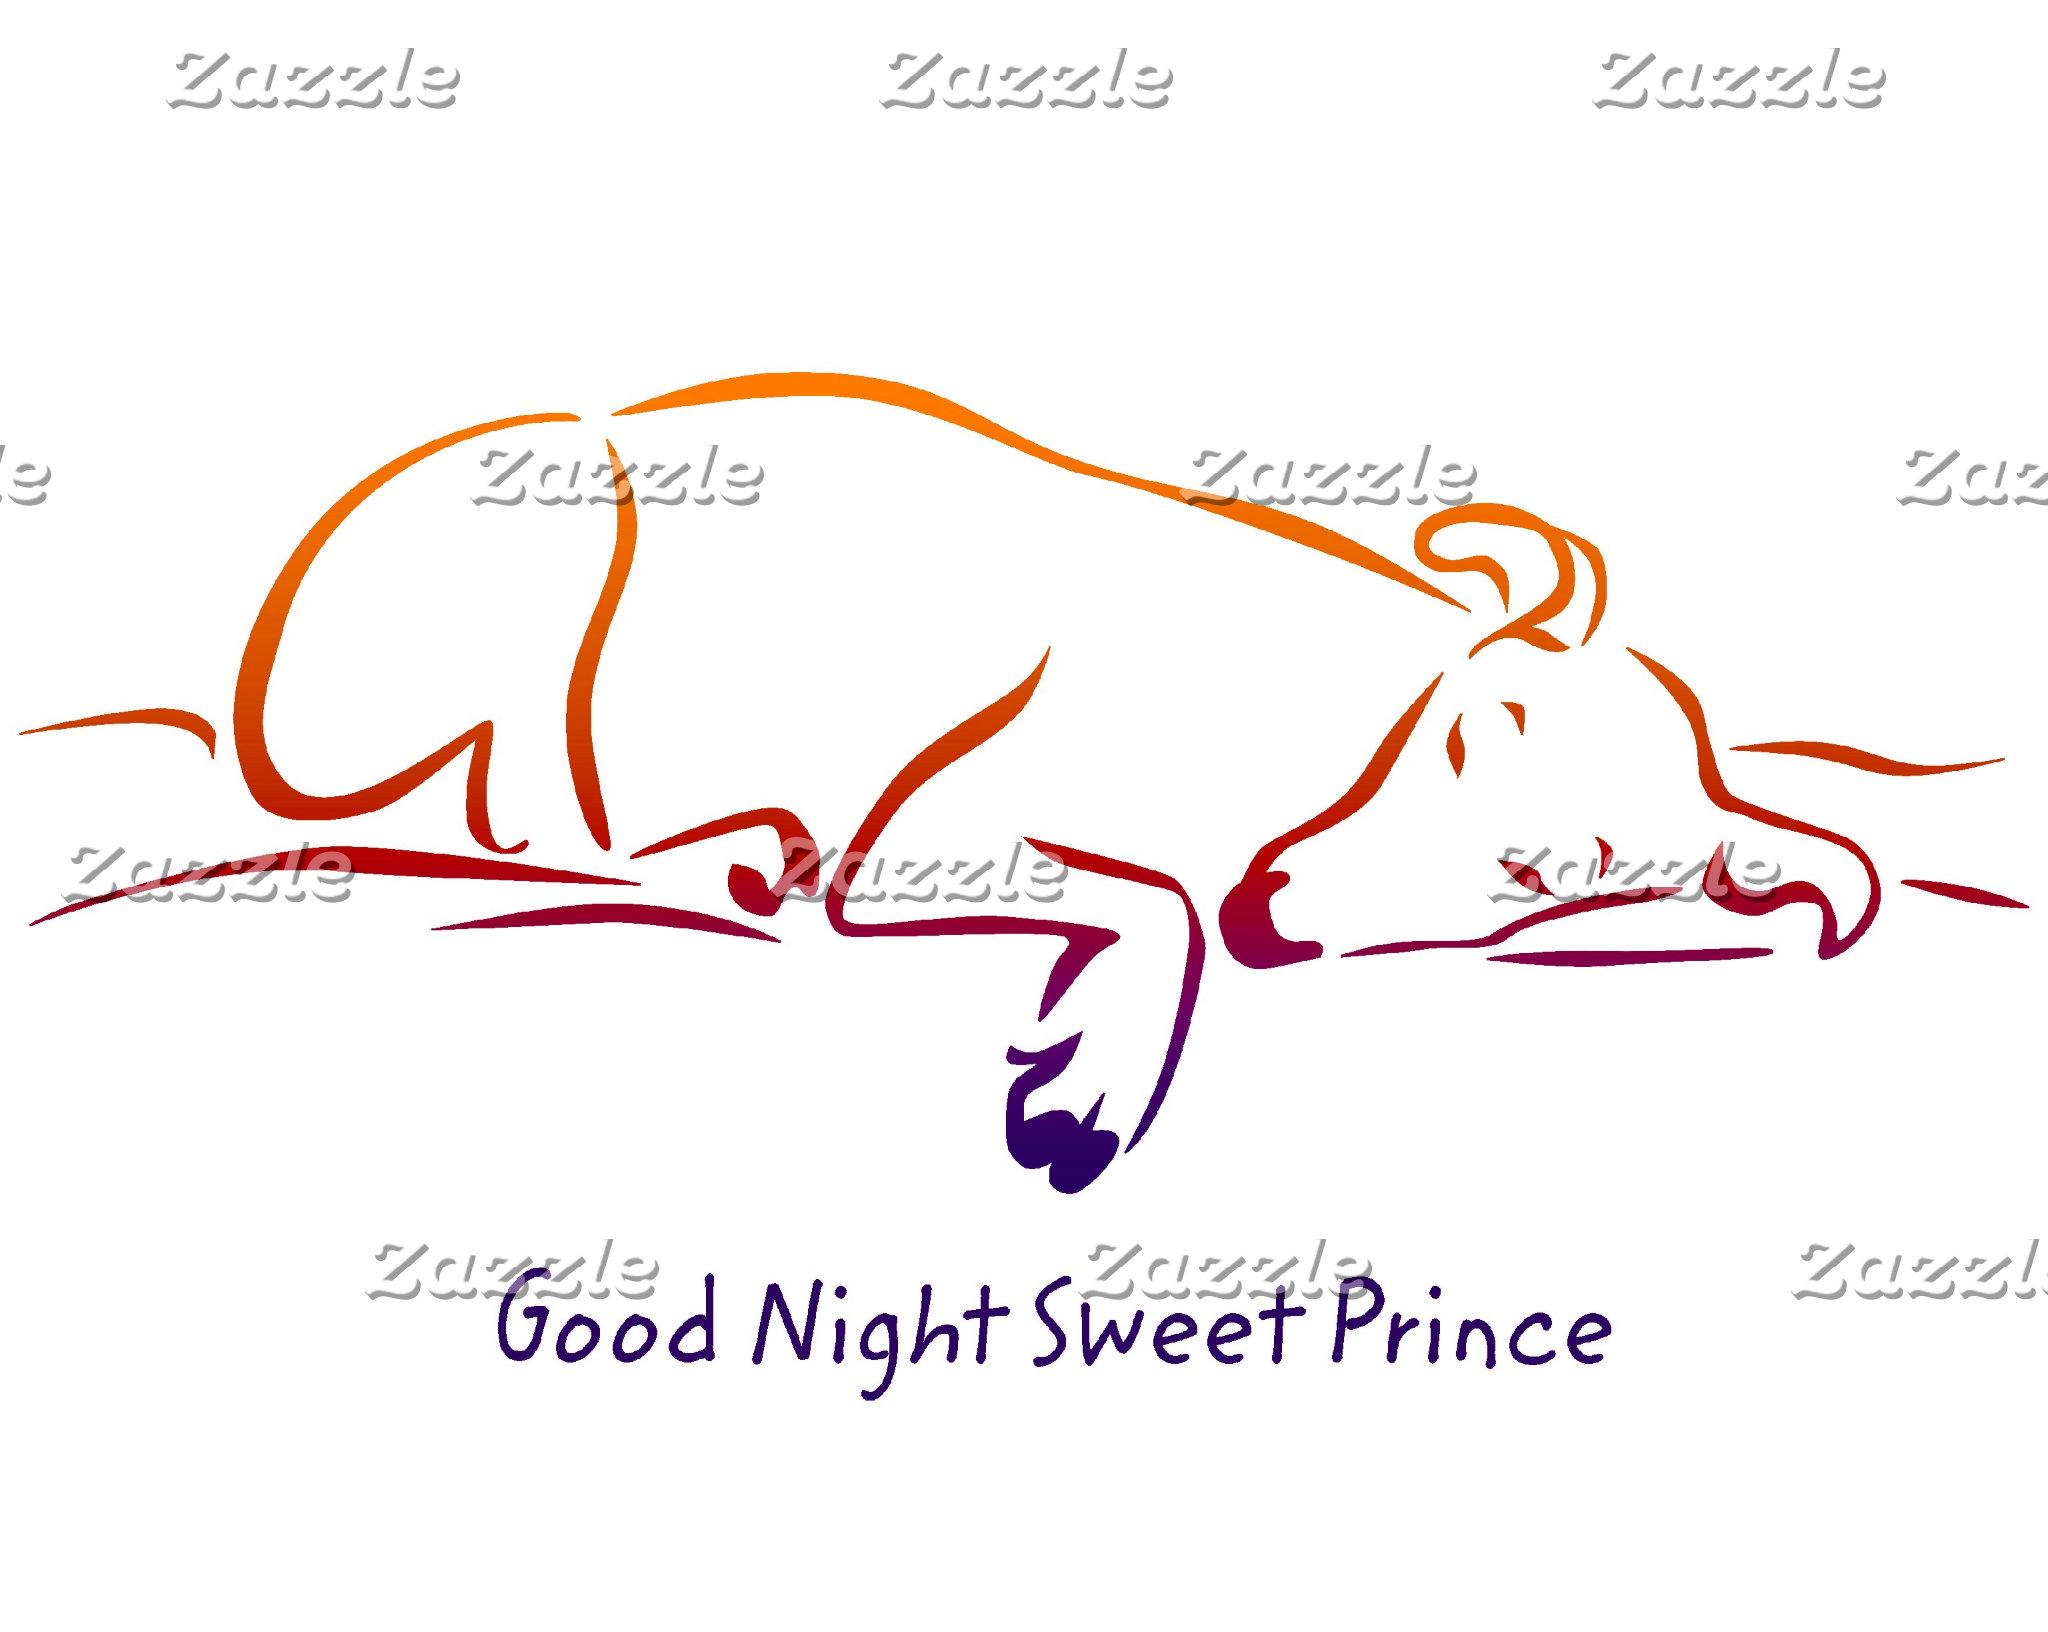 Good Night Sweet Prince